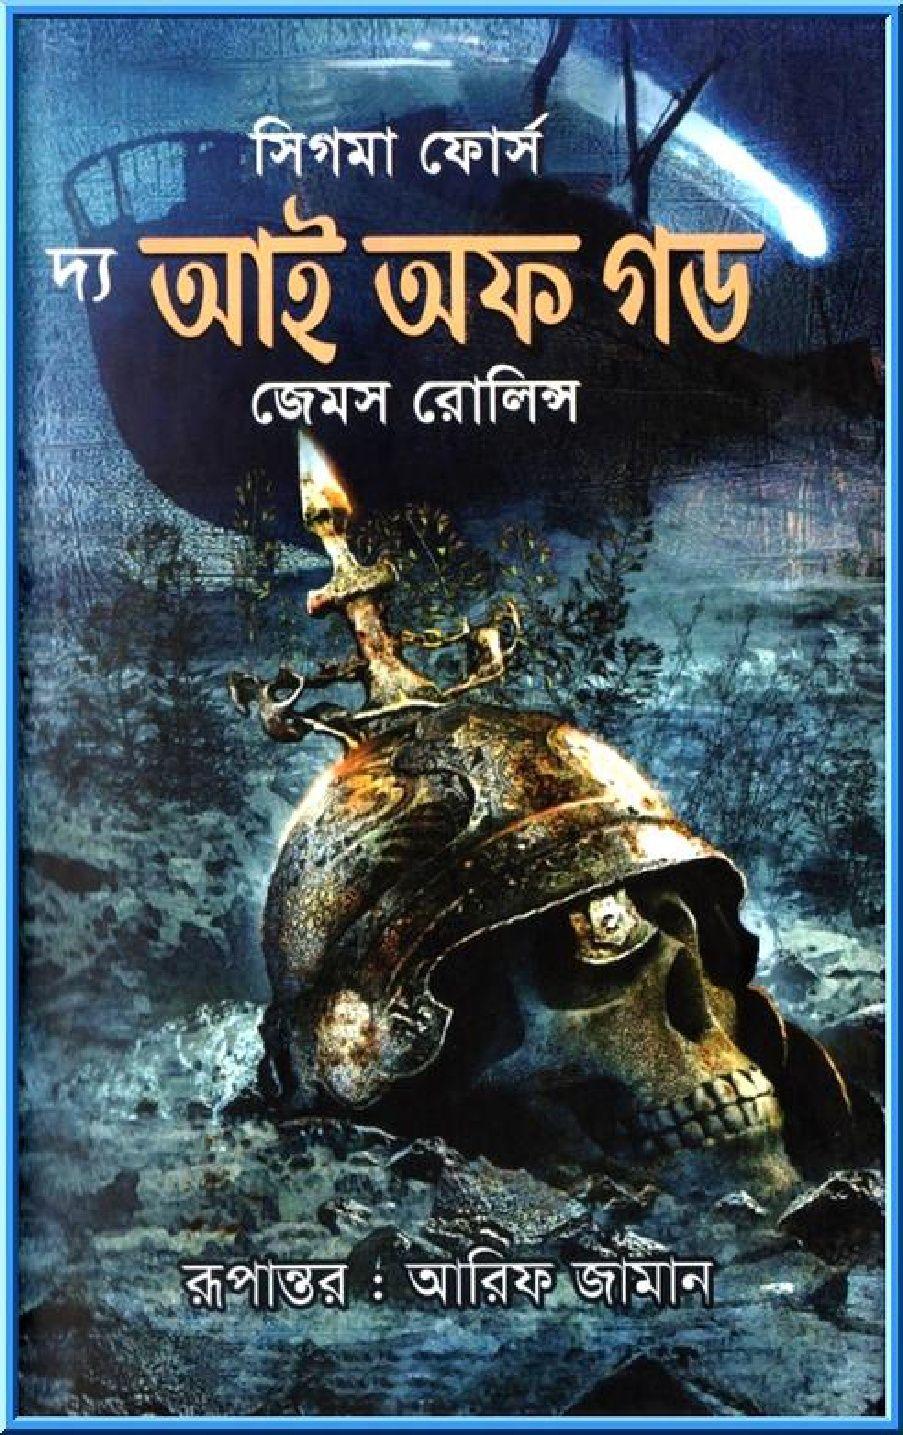 Quest pdf mahabharata